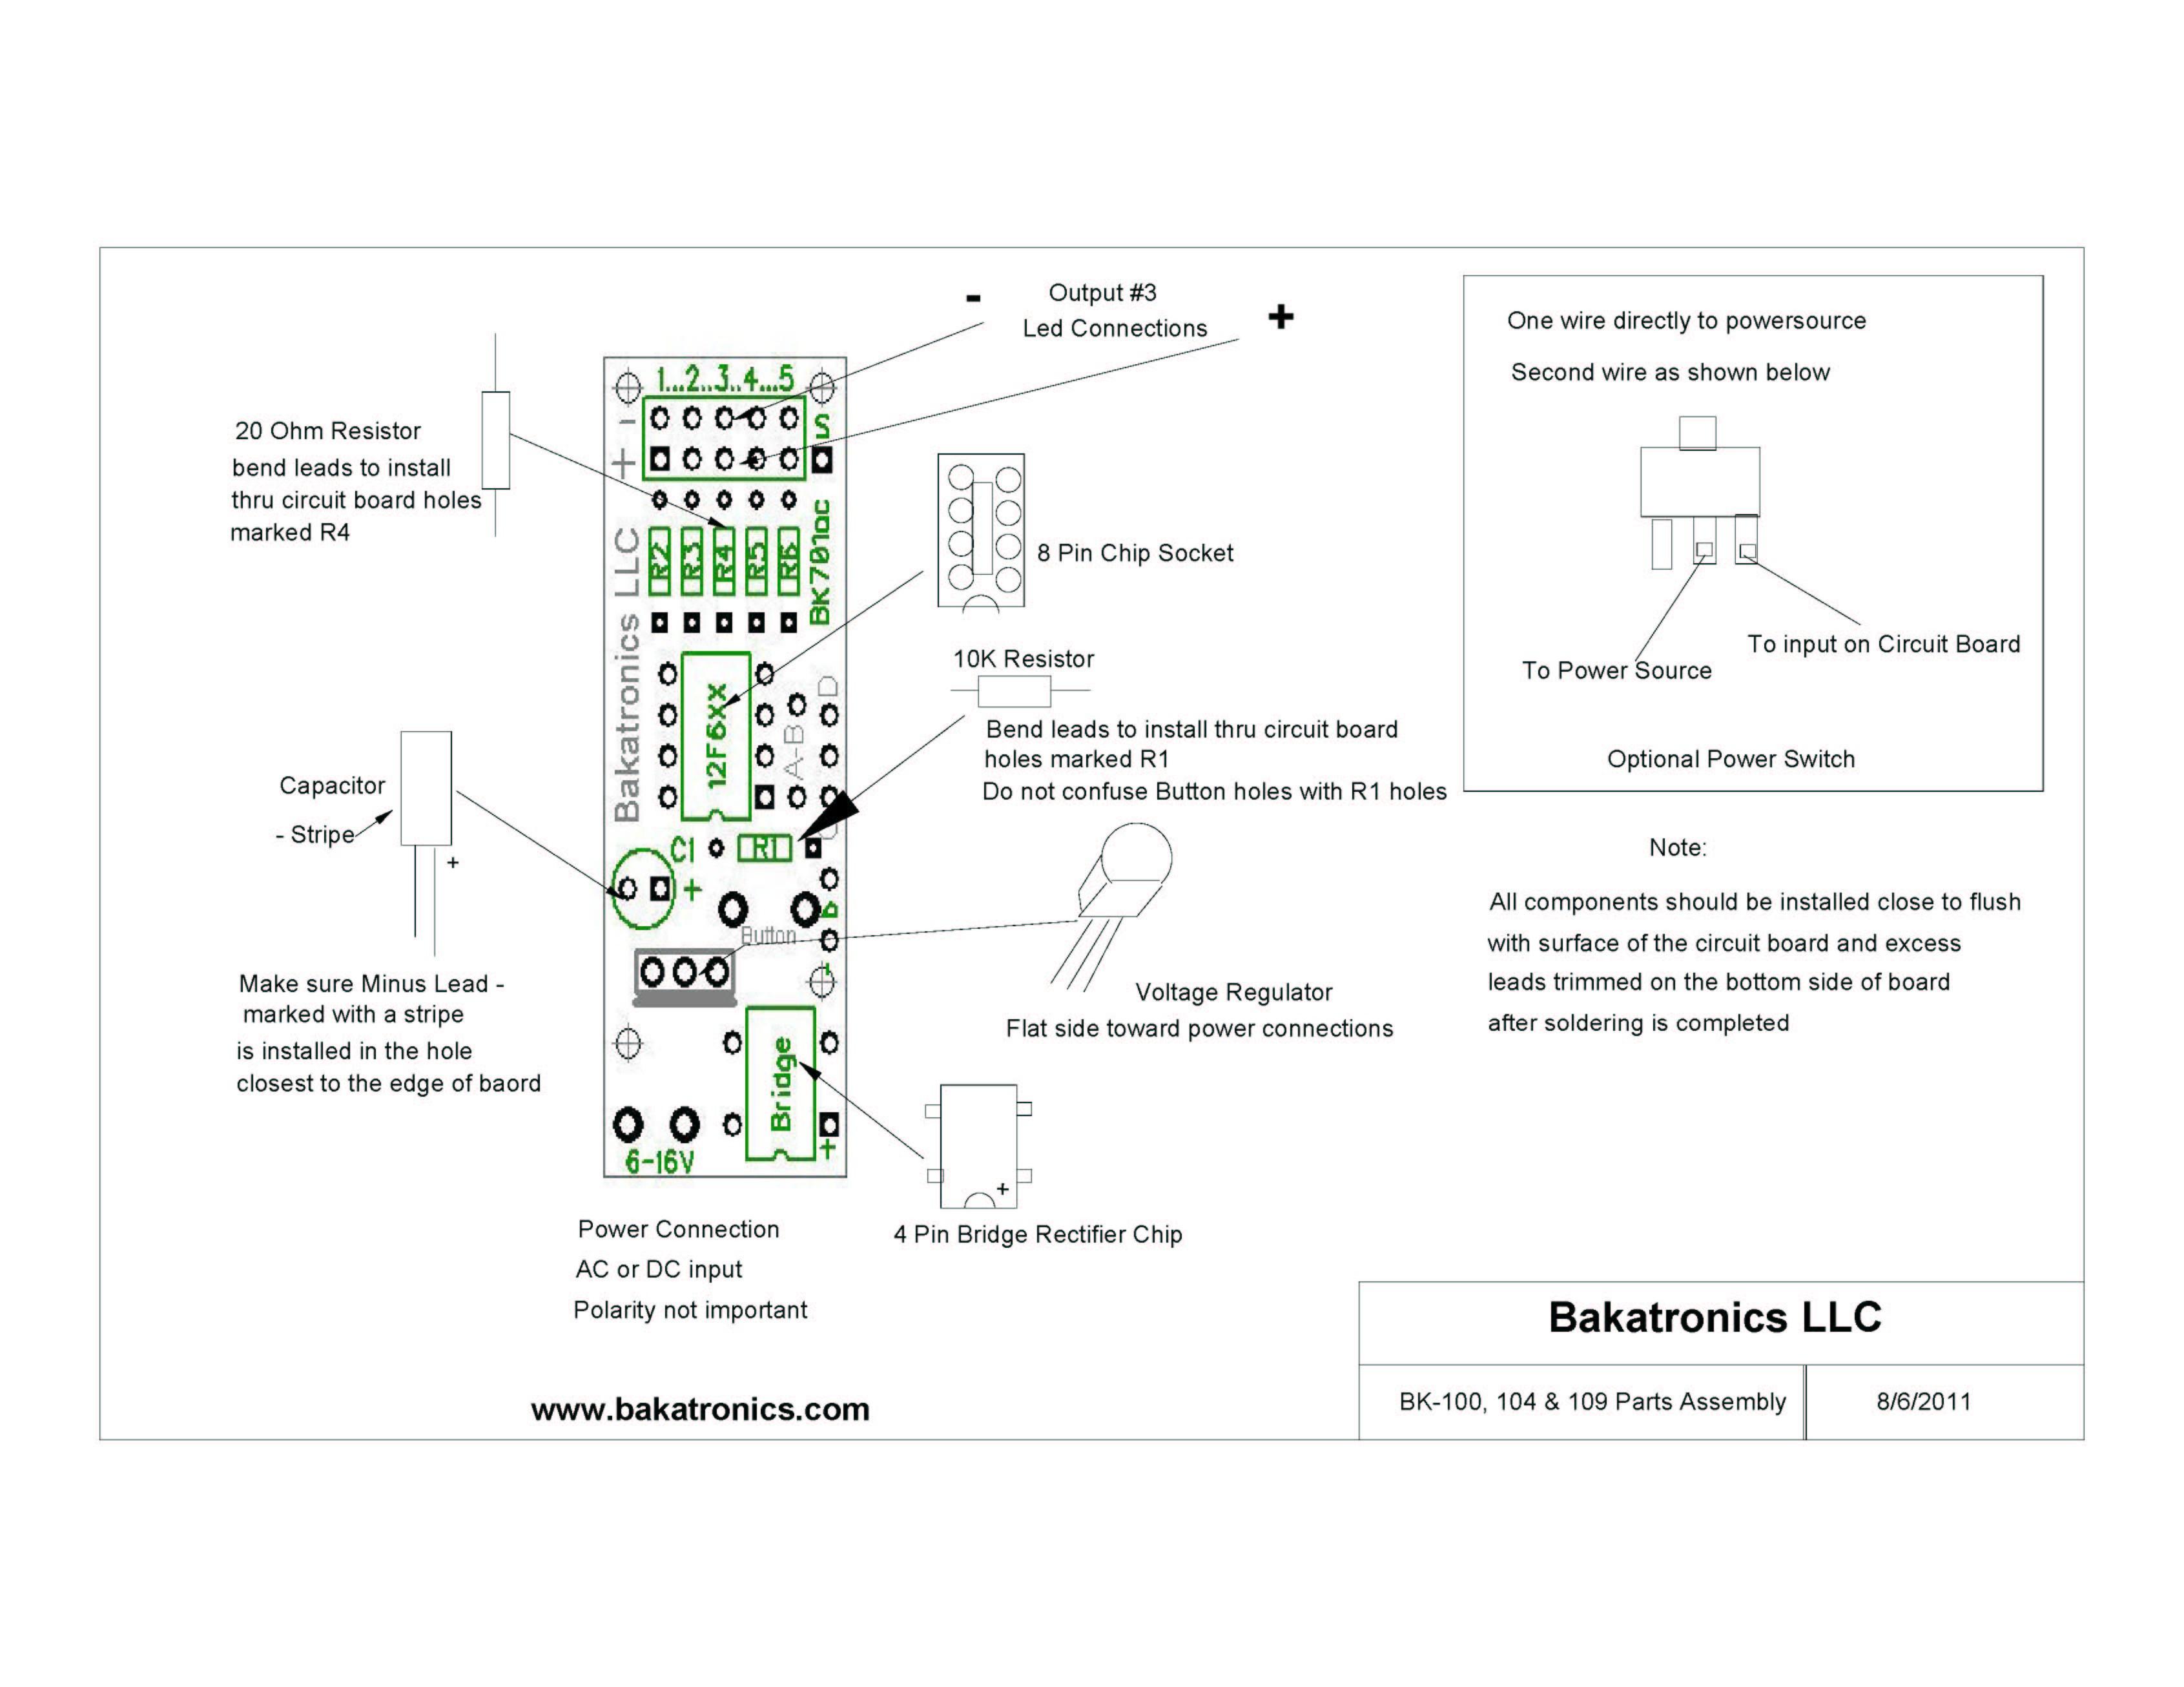 BK100 diagram